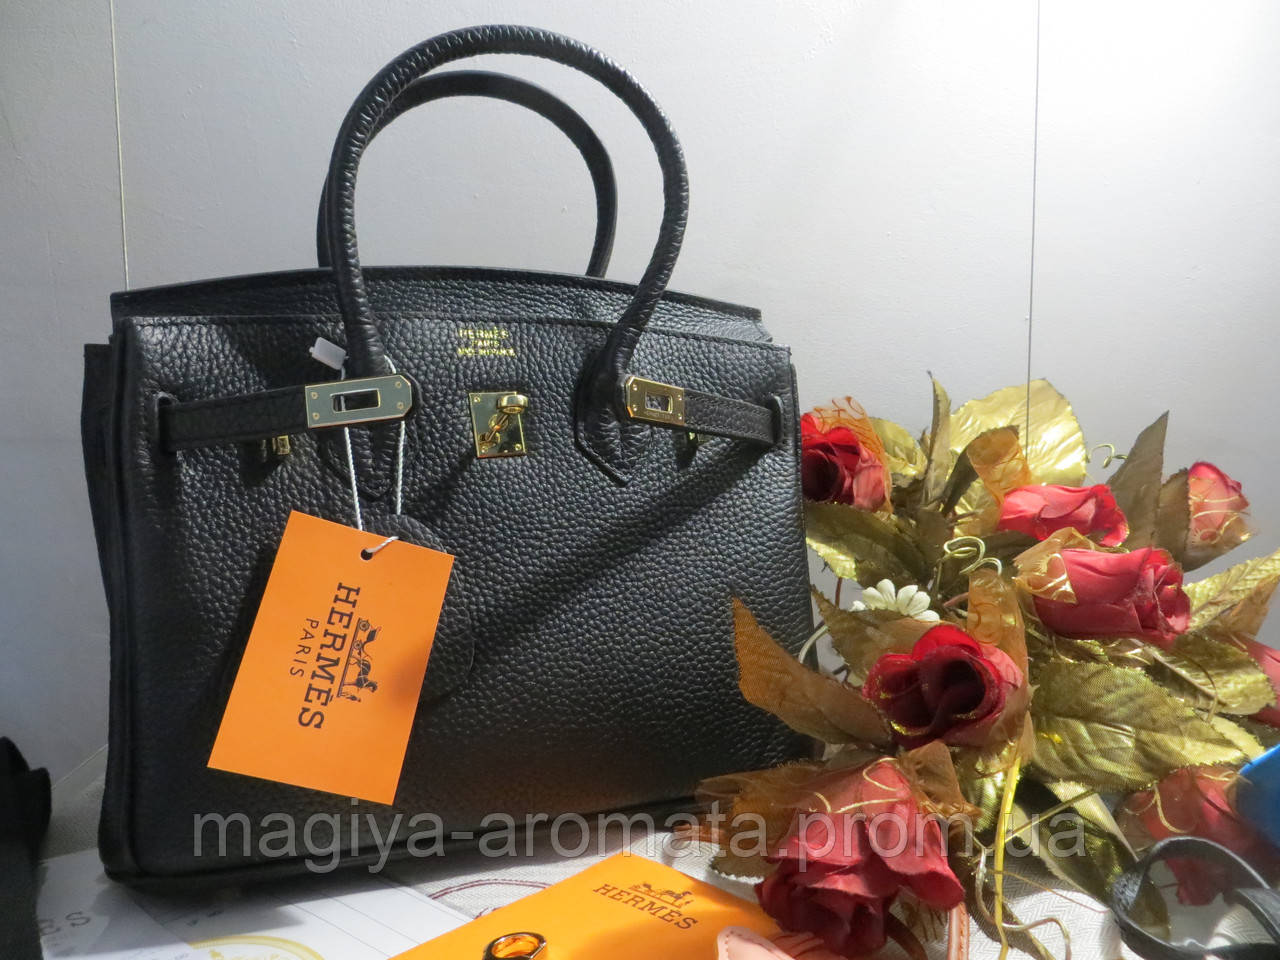 18e6cf539f07 Женская сумка от Hermes Birkin 20 см черная шикарная сумка Original quality,  цена 14 062,50 грн., купить в Киеве — Prom.ua (ID#911263631)